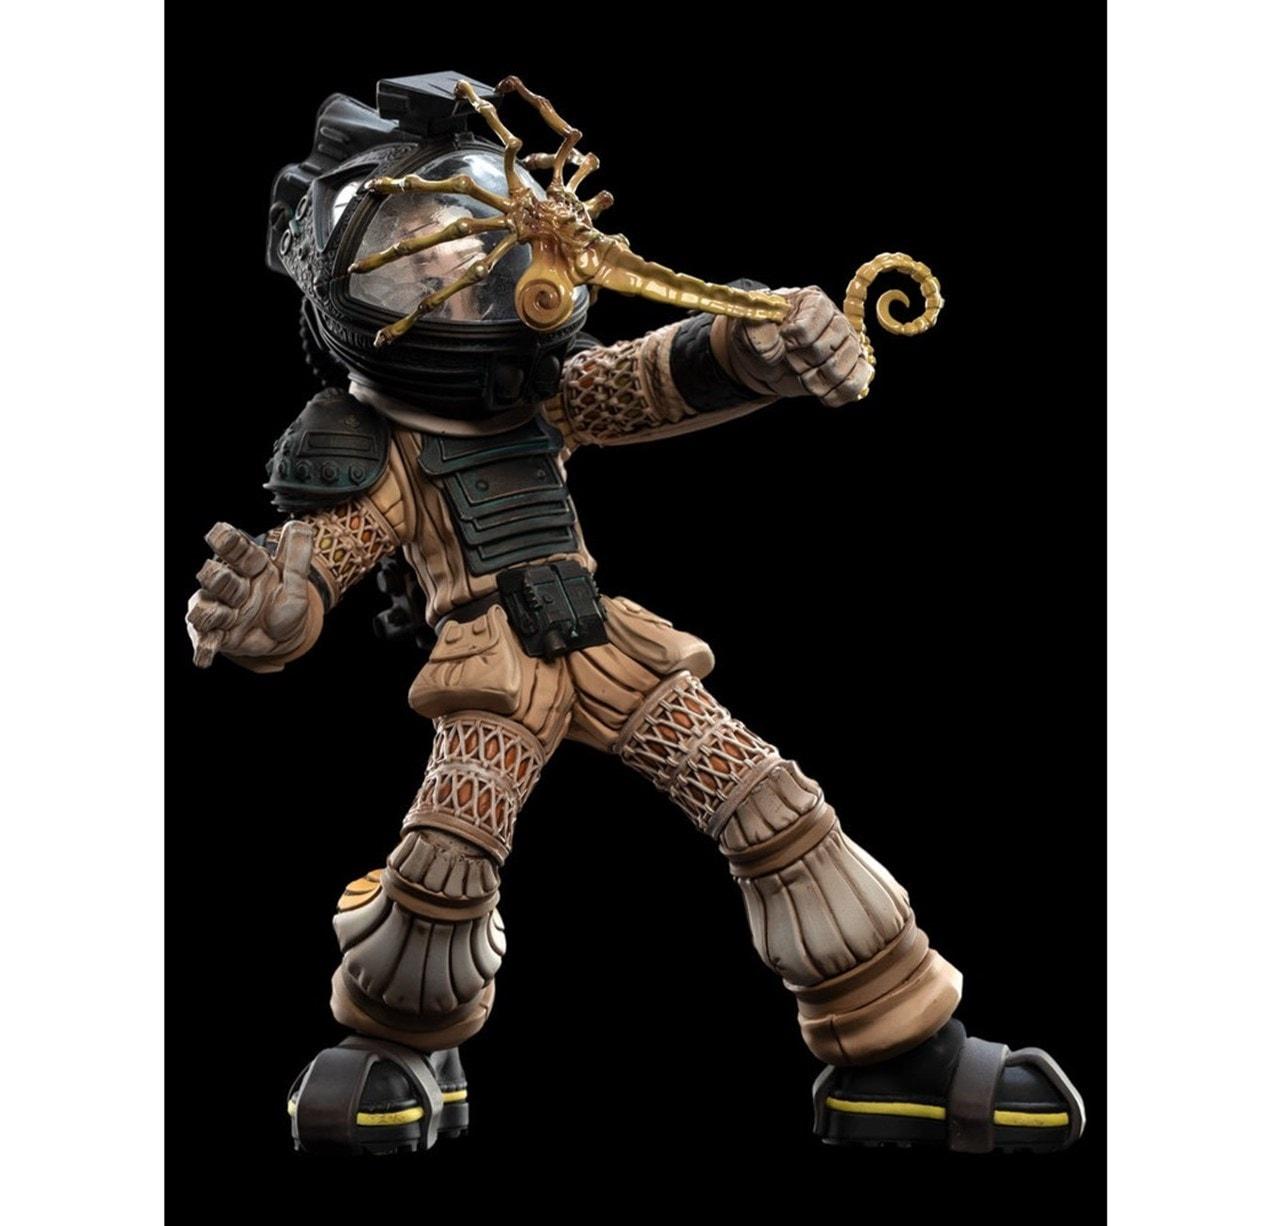 Facehugger: Alien: Weta Workshop Figurine - 1